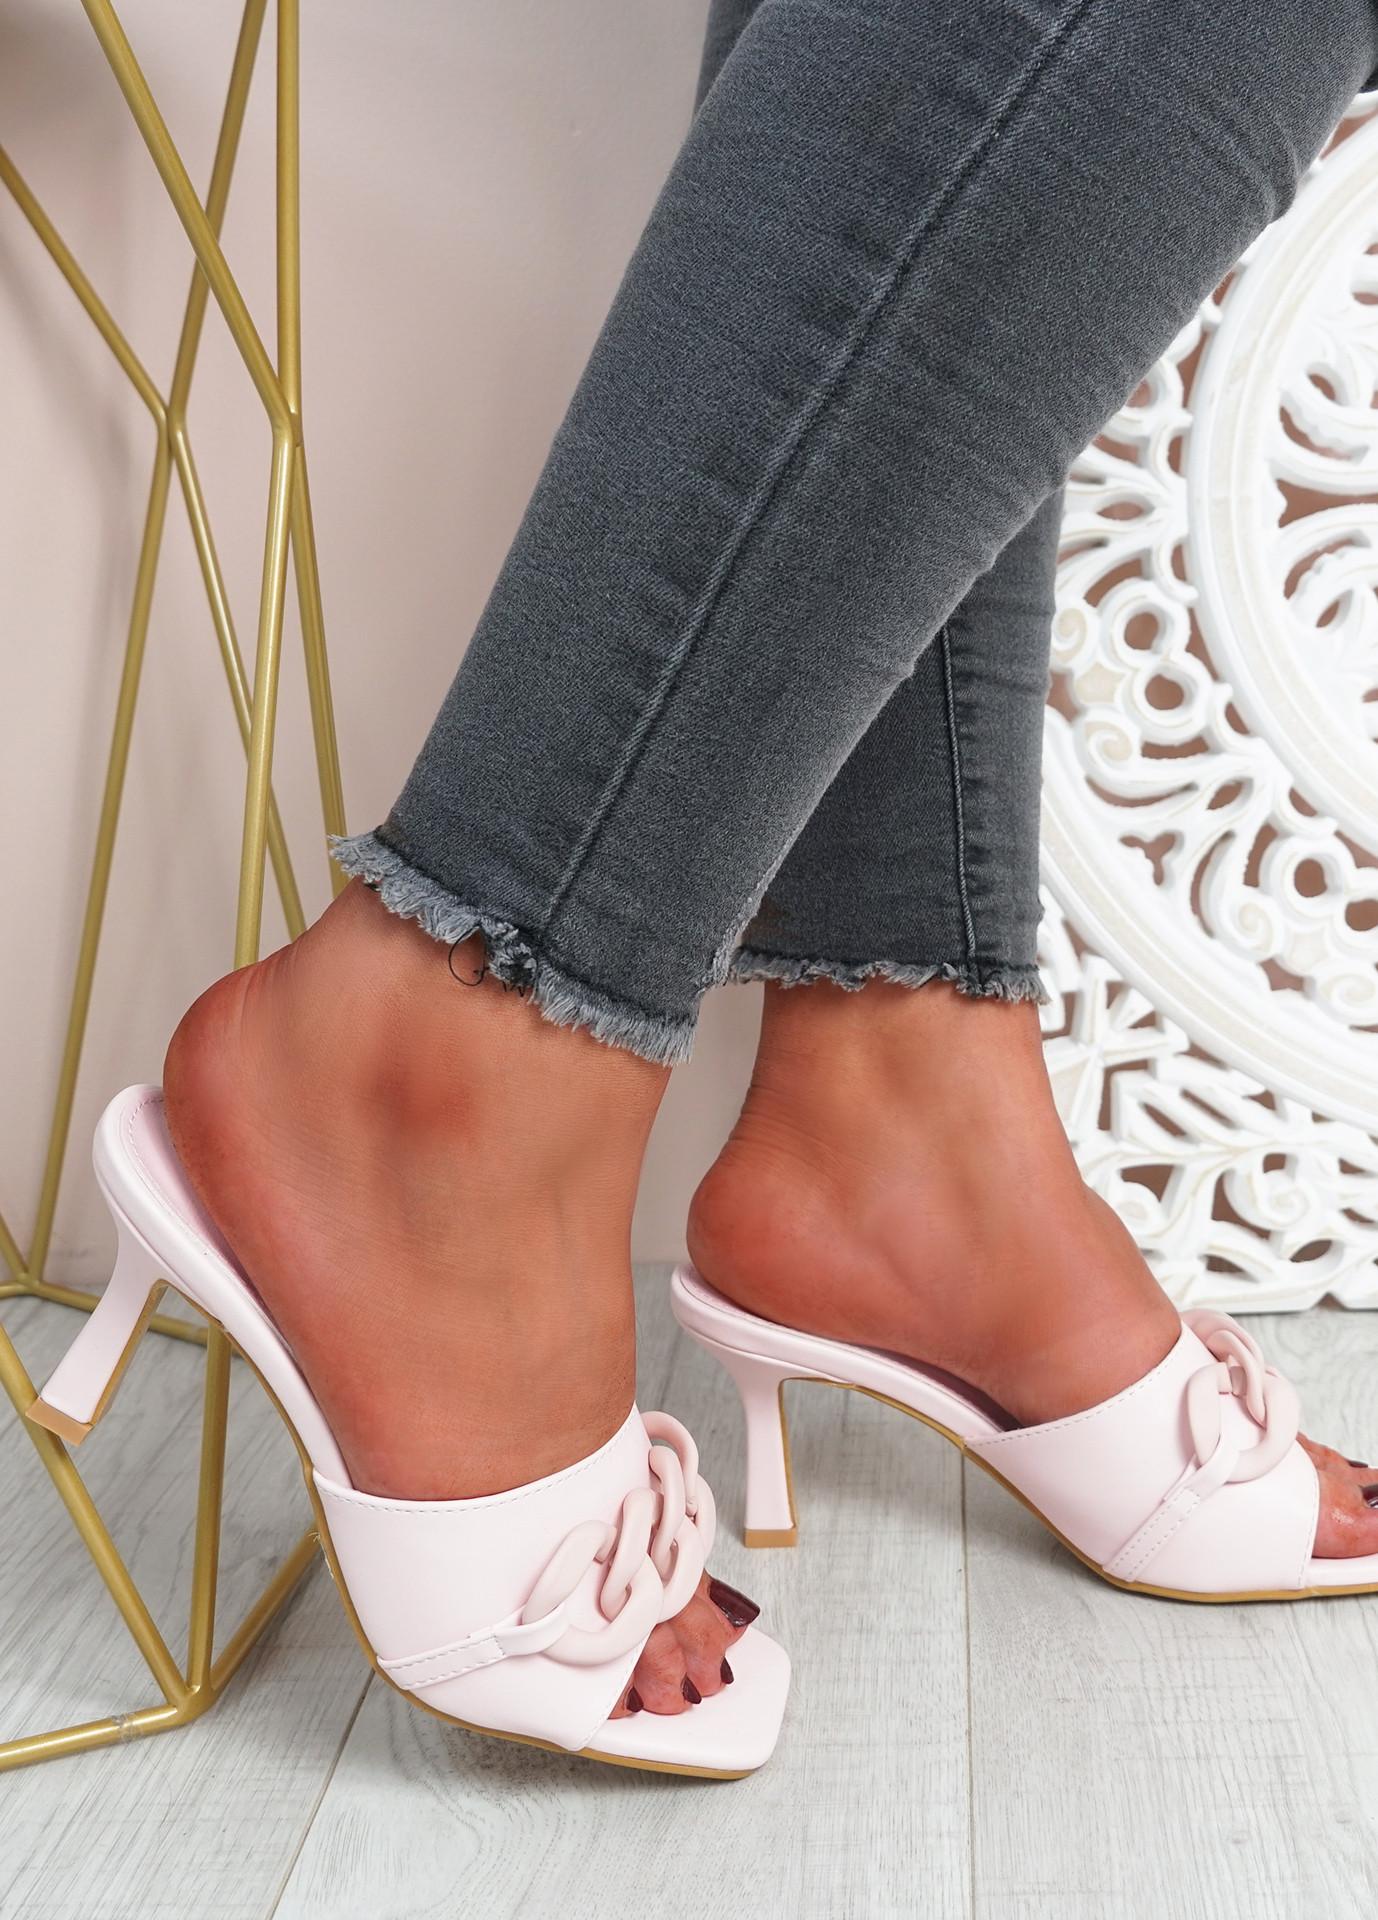 Nory Pink Slip On Stiletto Sandals